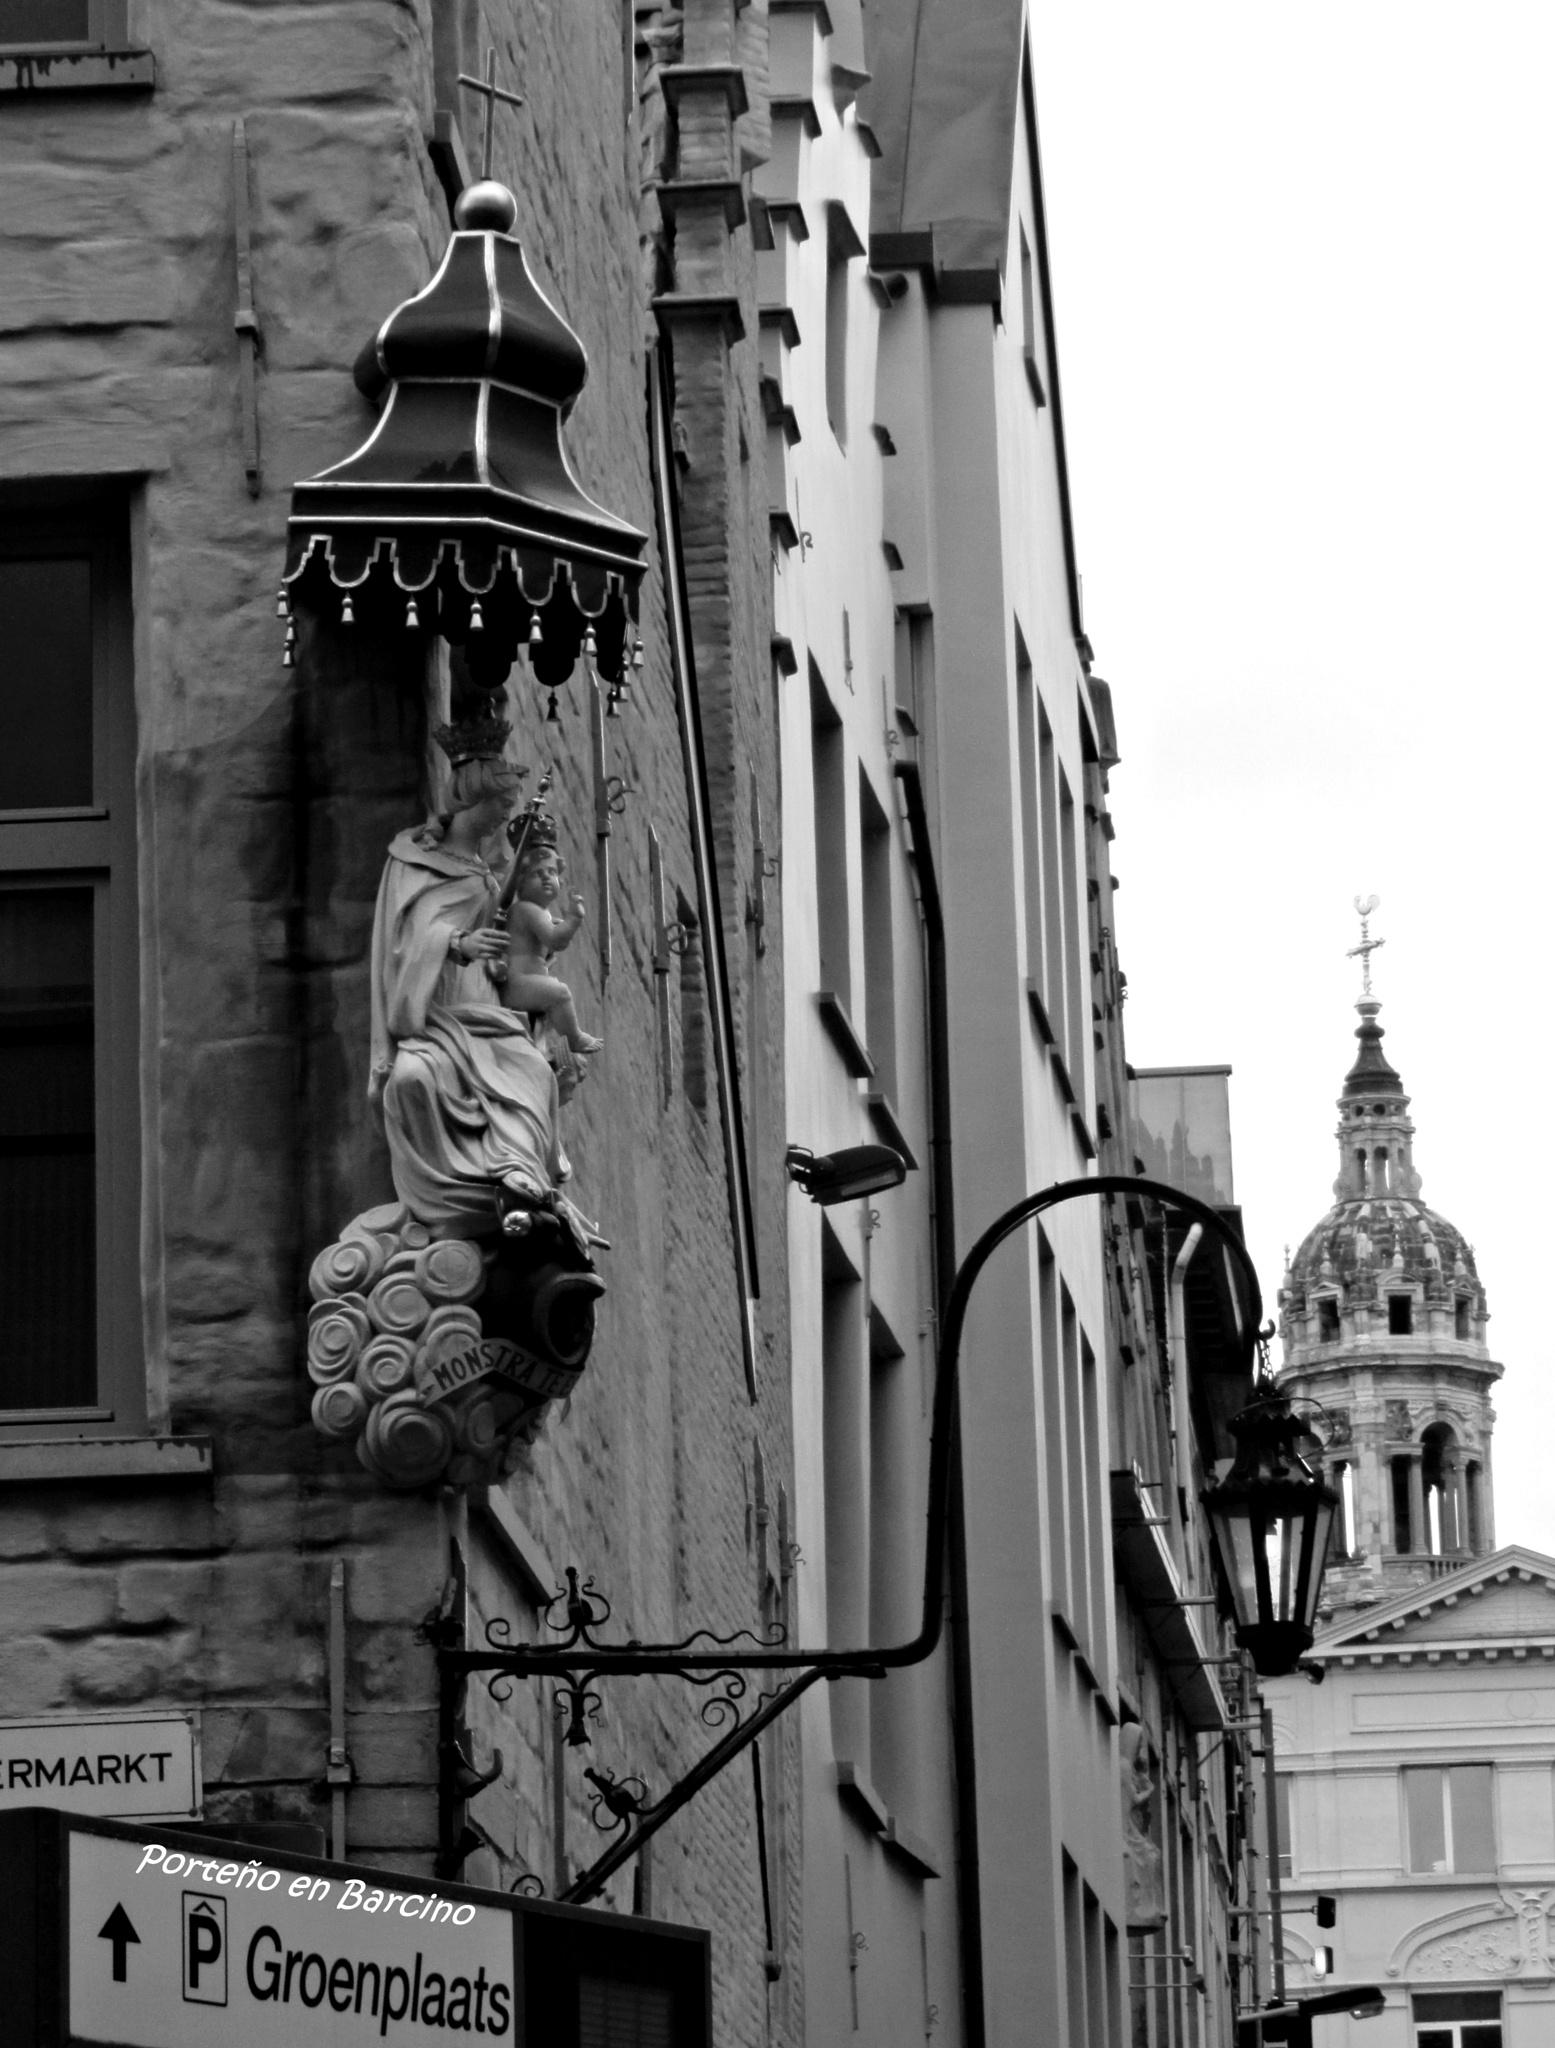 Religion & light by PortenyoBarcino